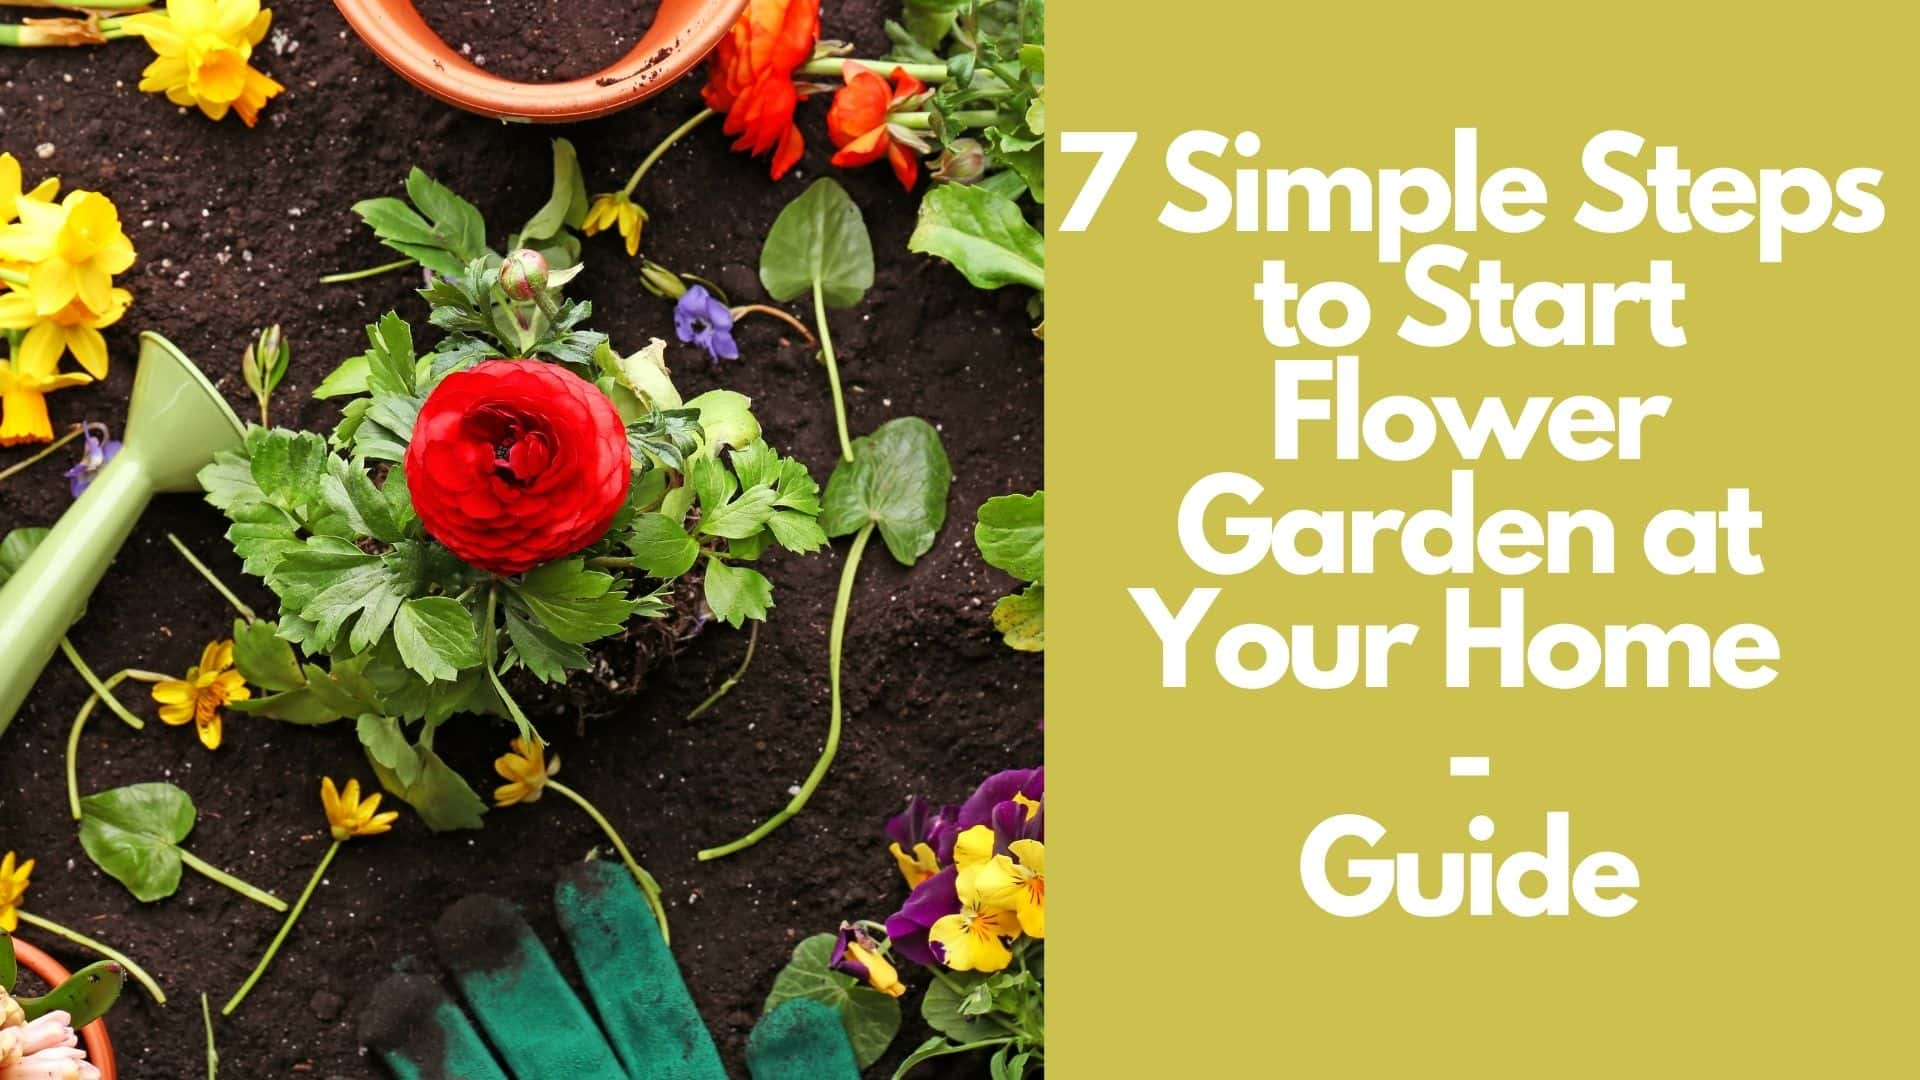 How to Start a Flower Garden: 7 Steps for Beginners | Guide